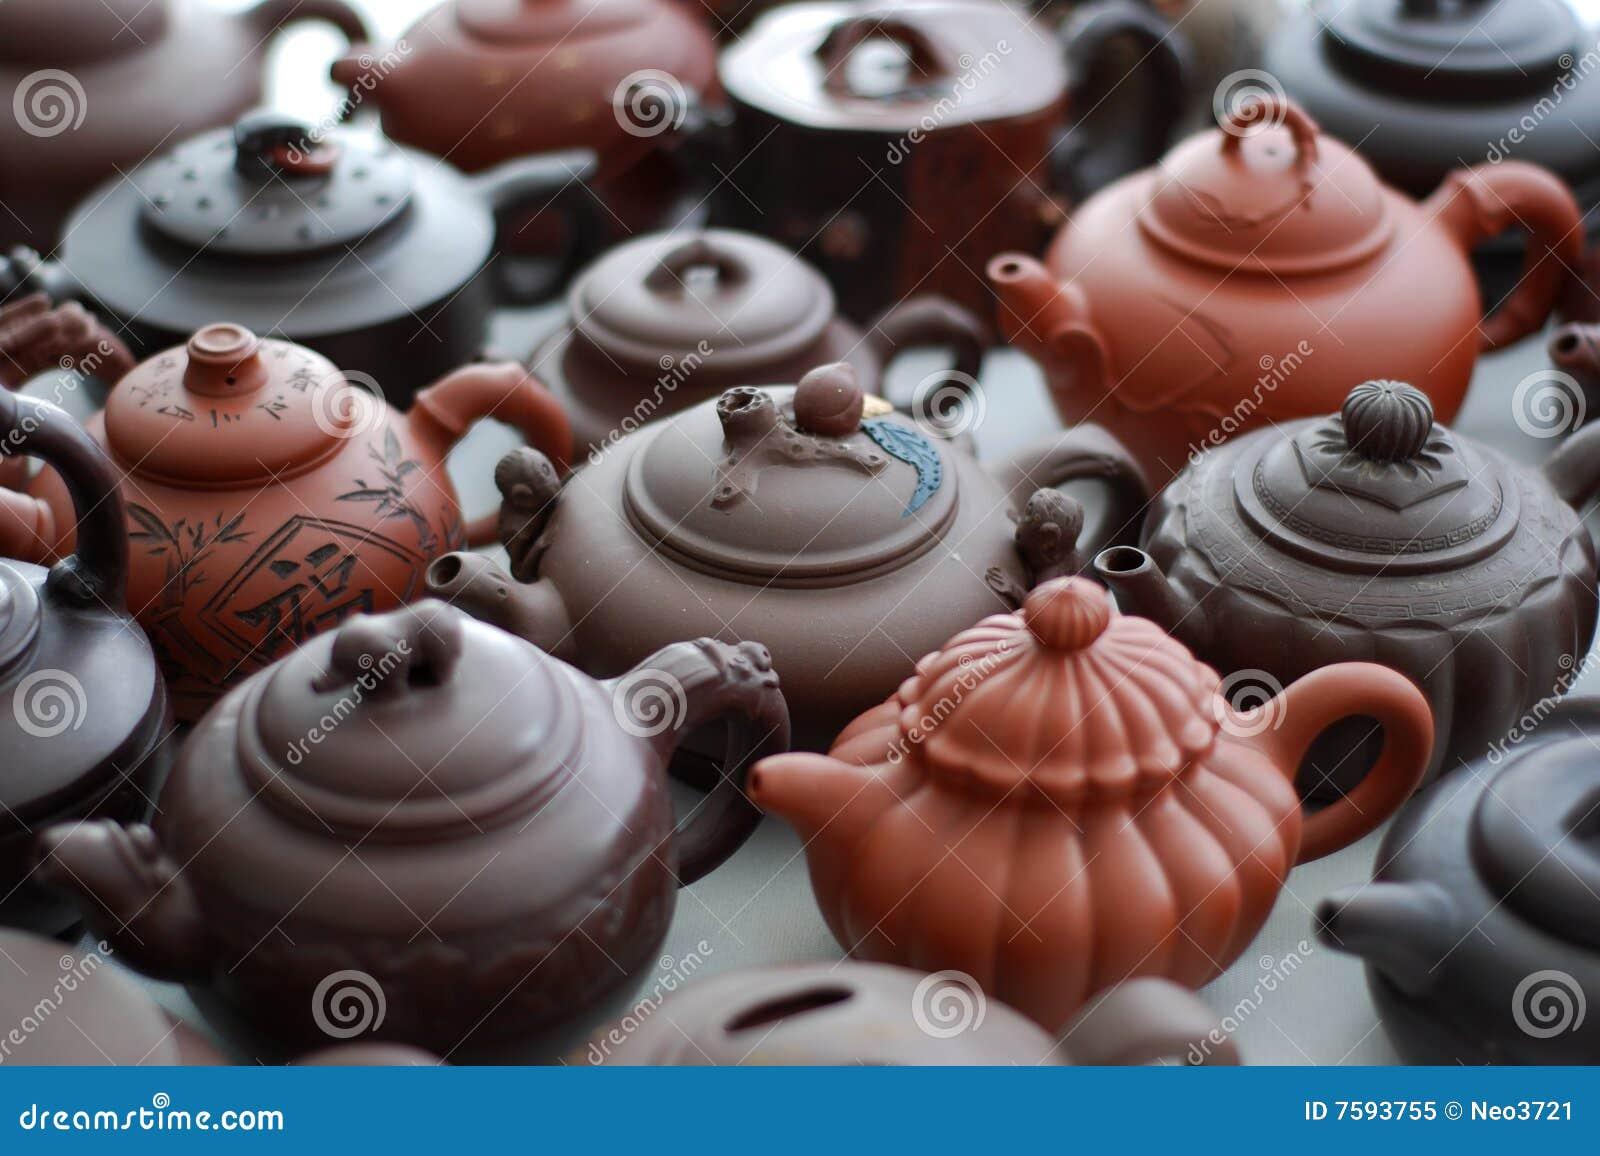 tea pot royalty free stock photo image 7593755